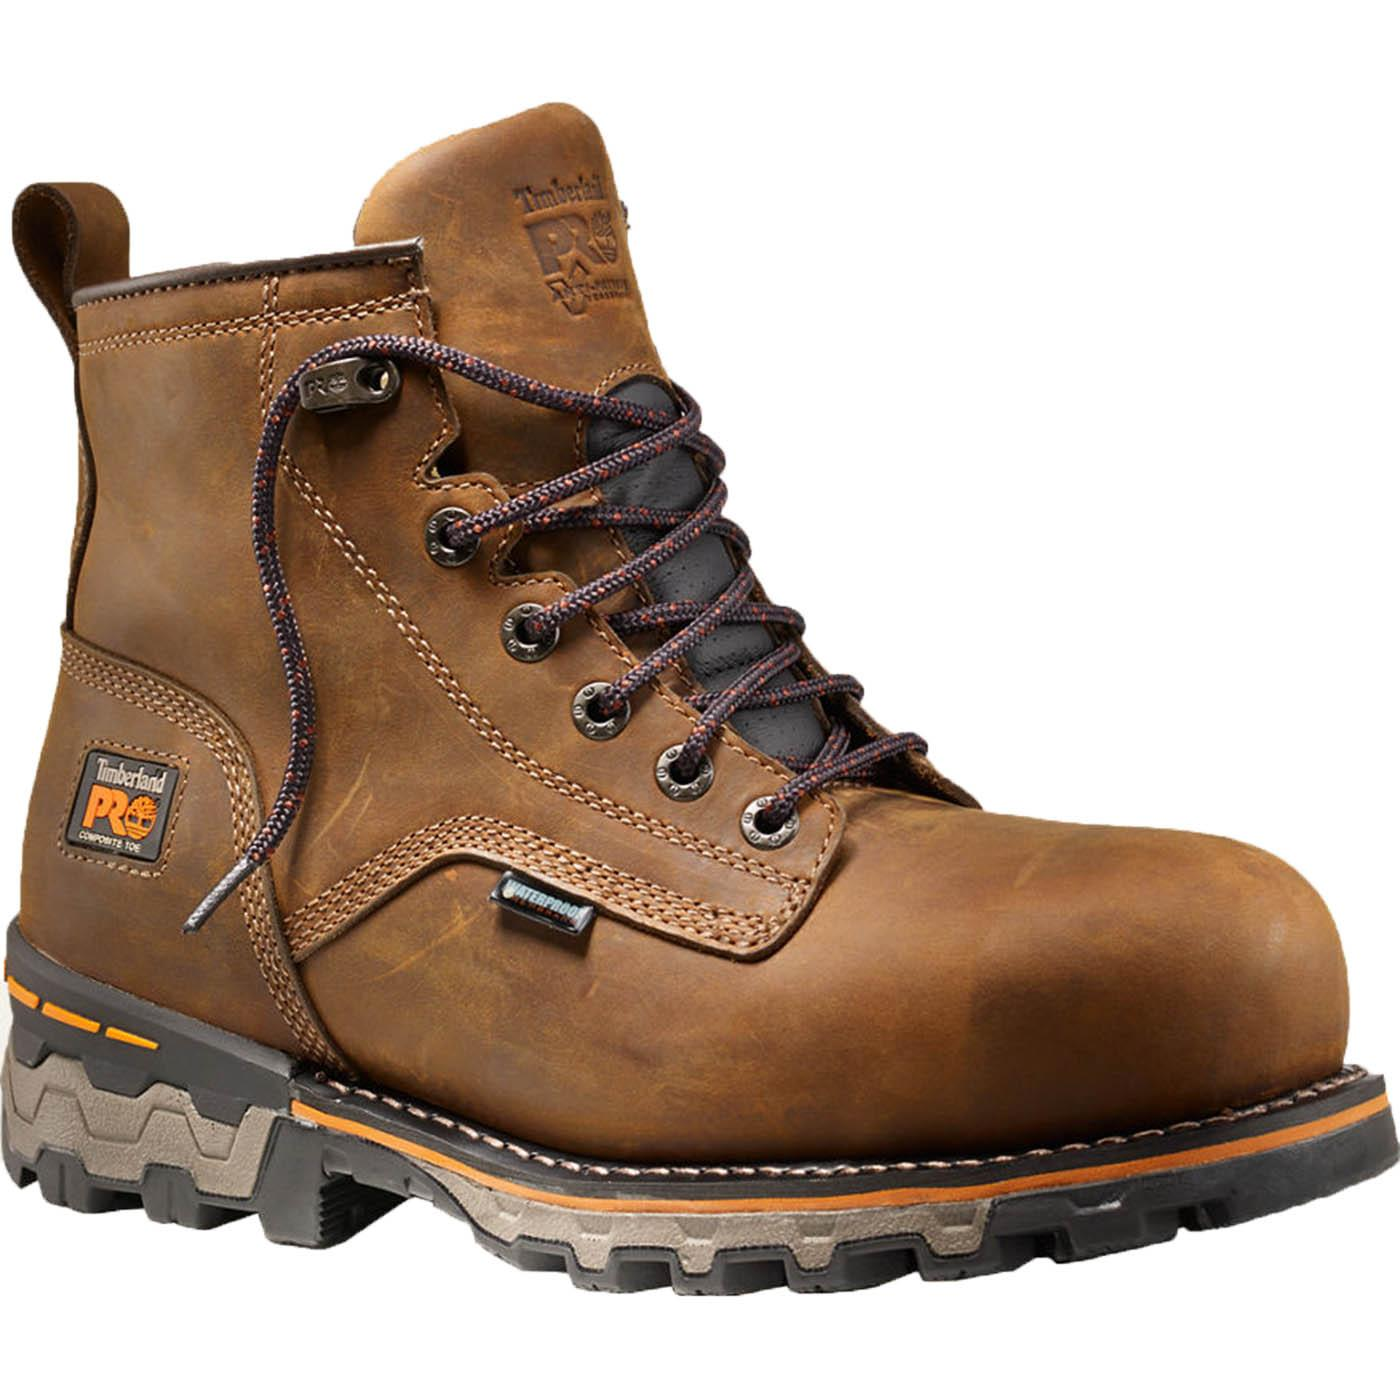 7227f8ad23b Timberland PRO Boondock Composite Toe Waterproof Work Boot